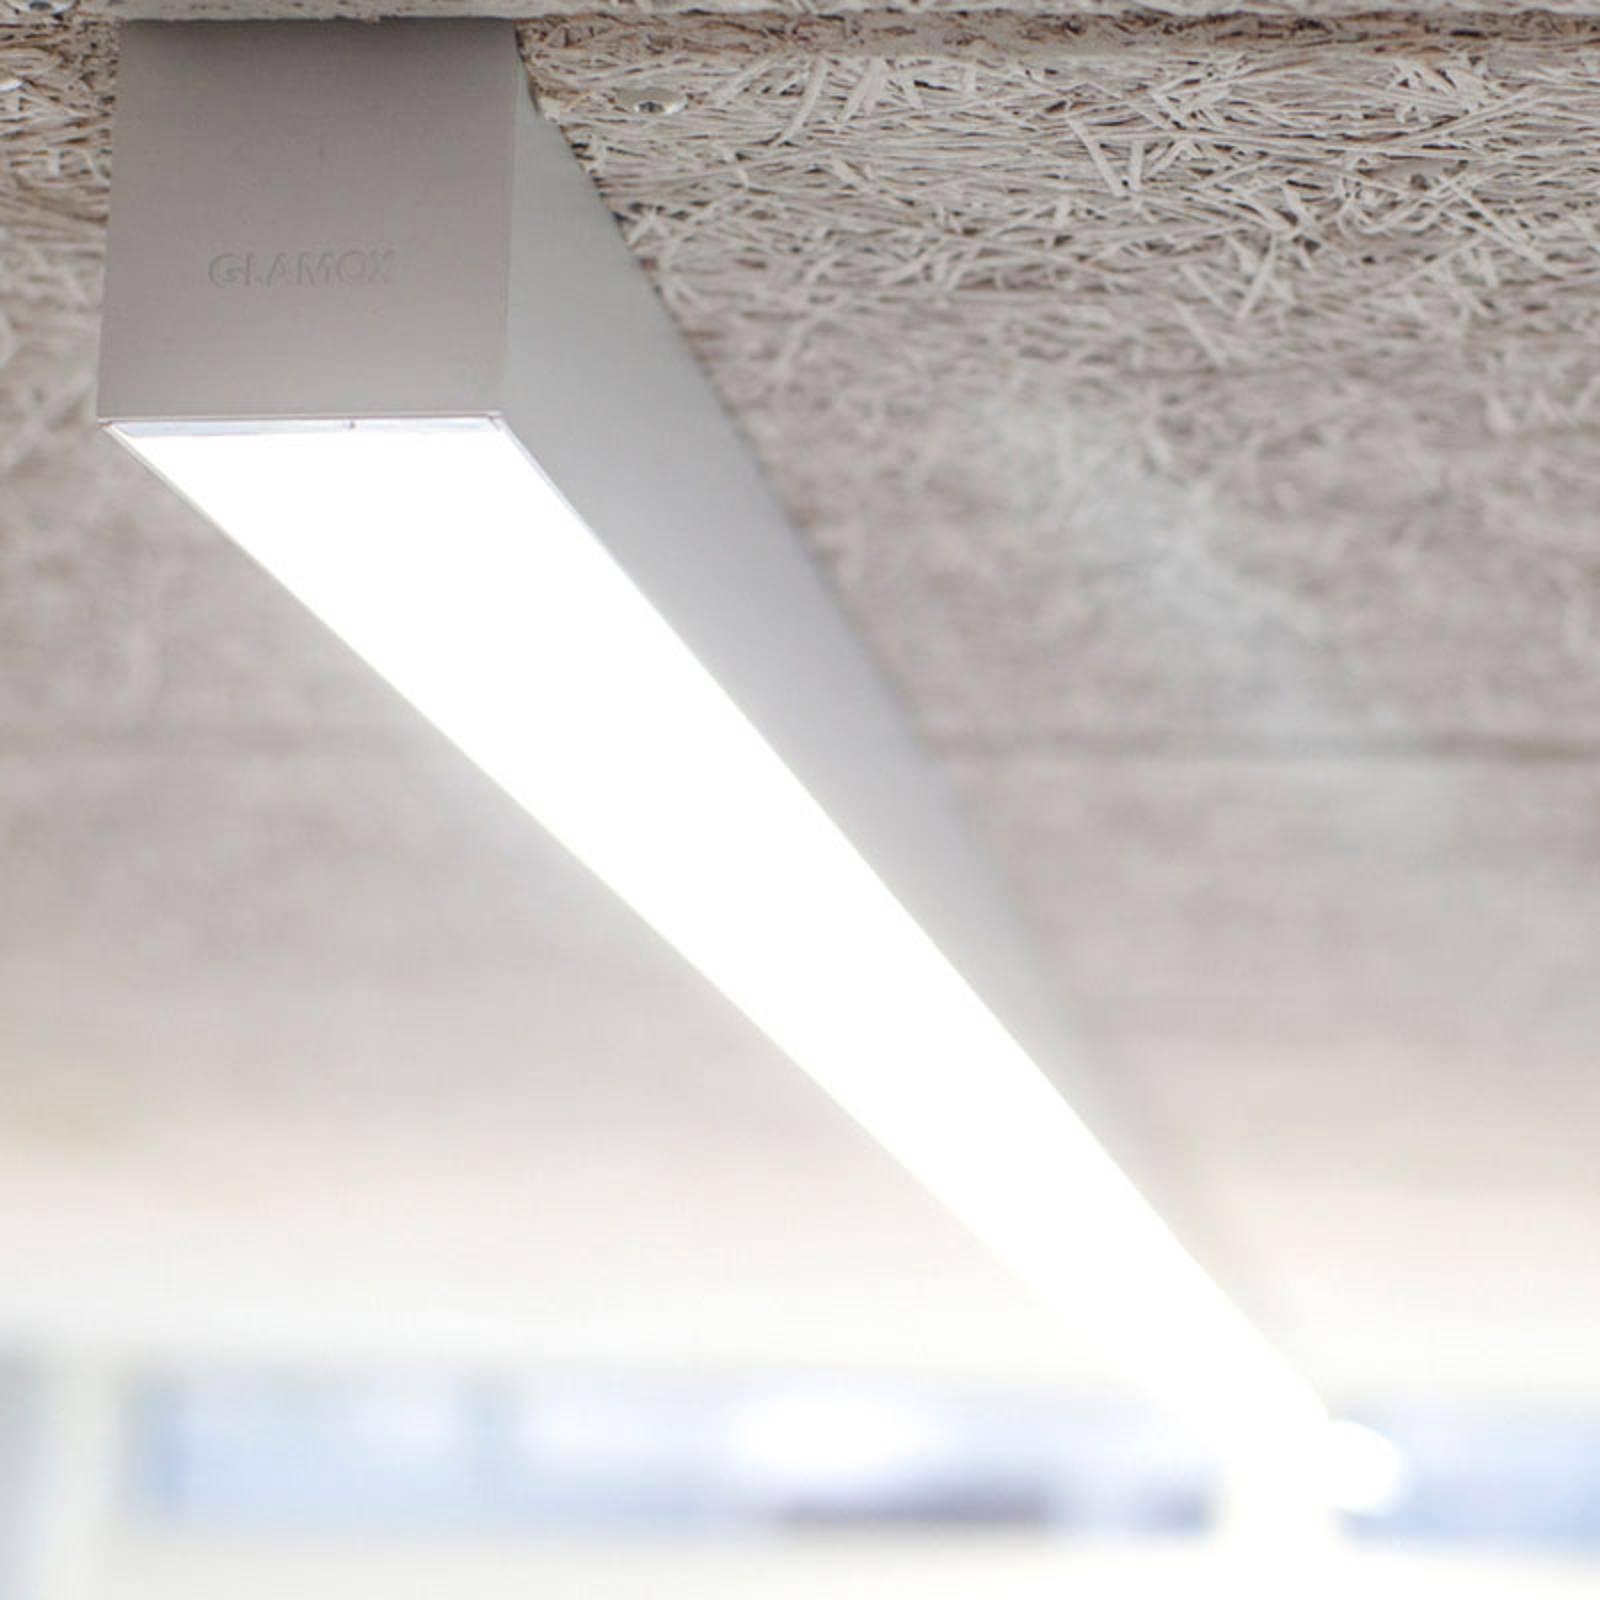 LED-kattovalaisin C80-SR HF 830 1855 lm 169 cm